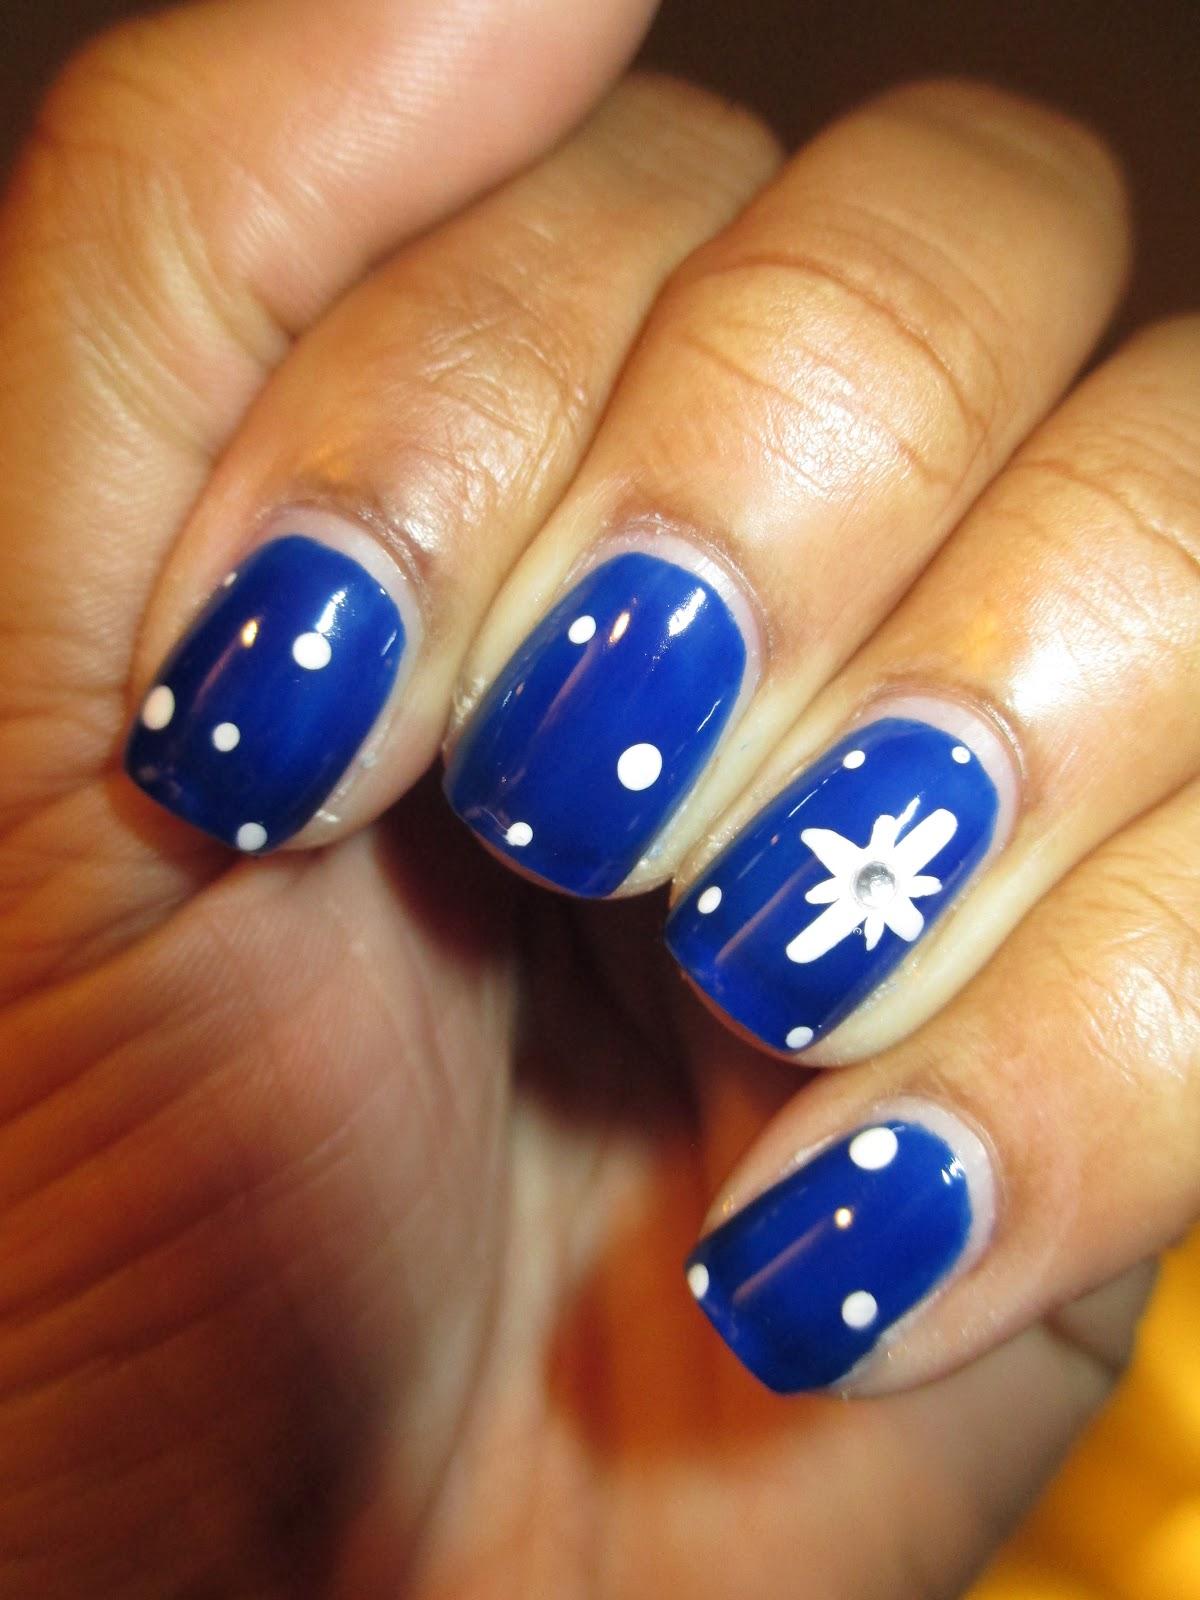 35 Nail Design Ideas For The Latest Autumn Winter Trends: 35 Fantastic Star Nail Art Ideas